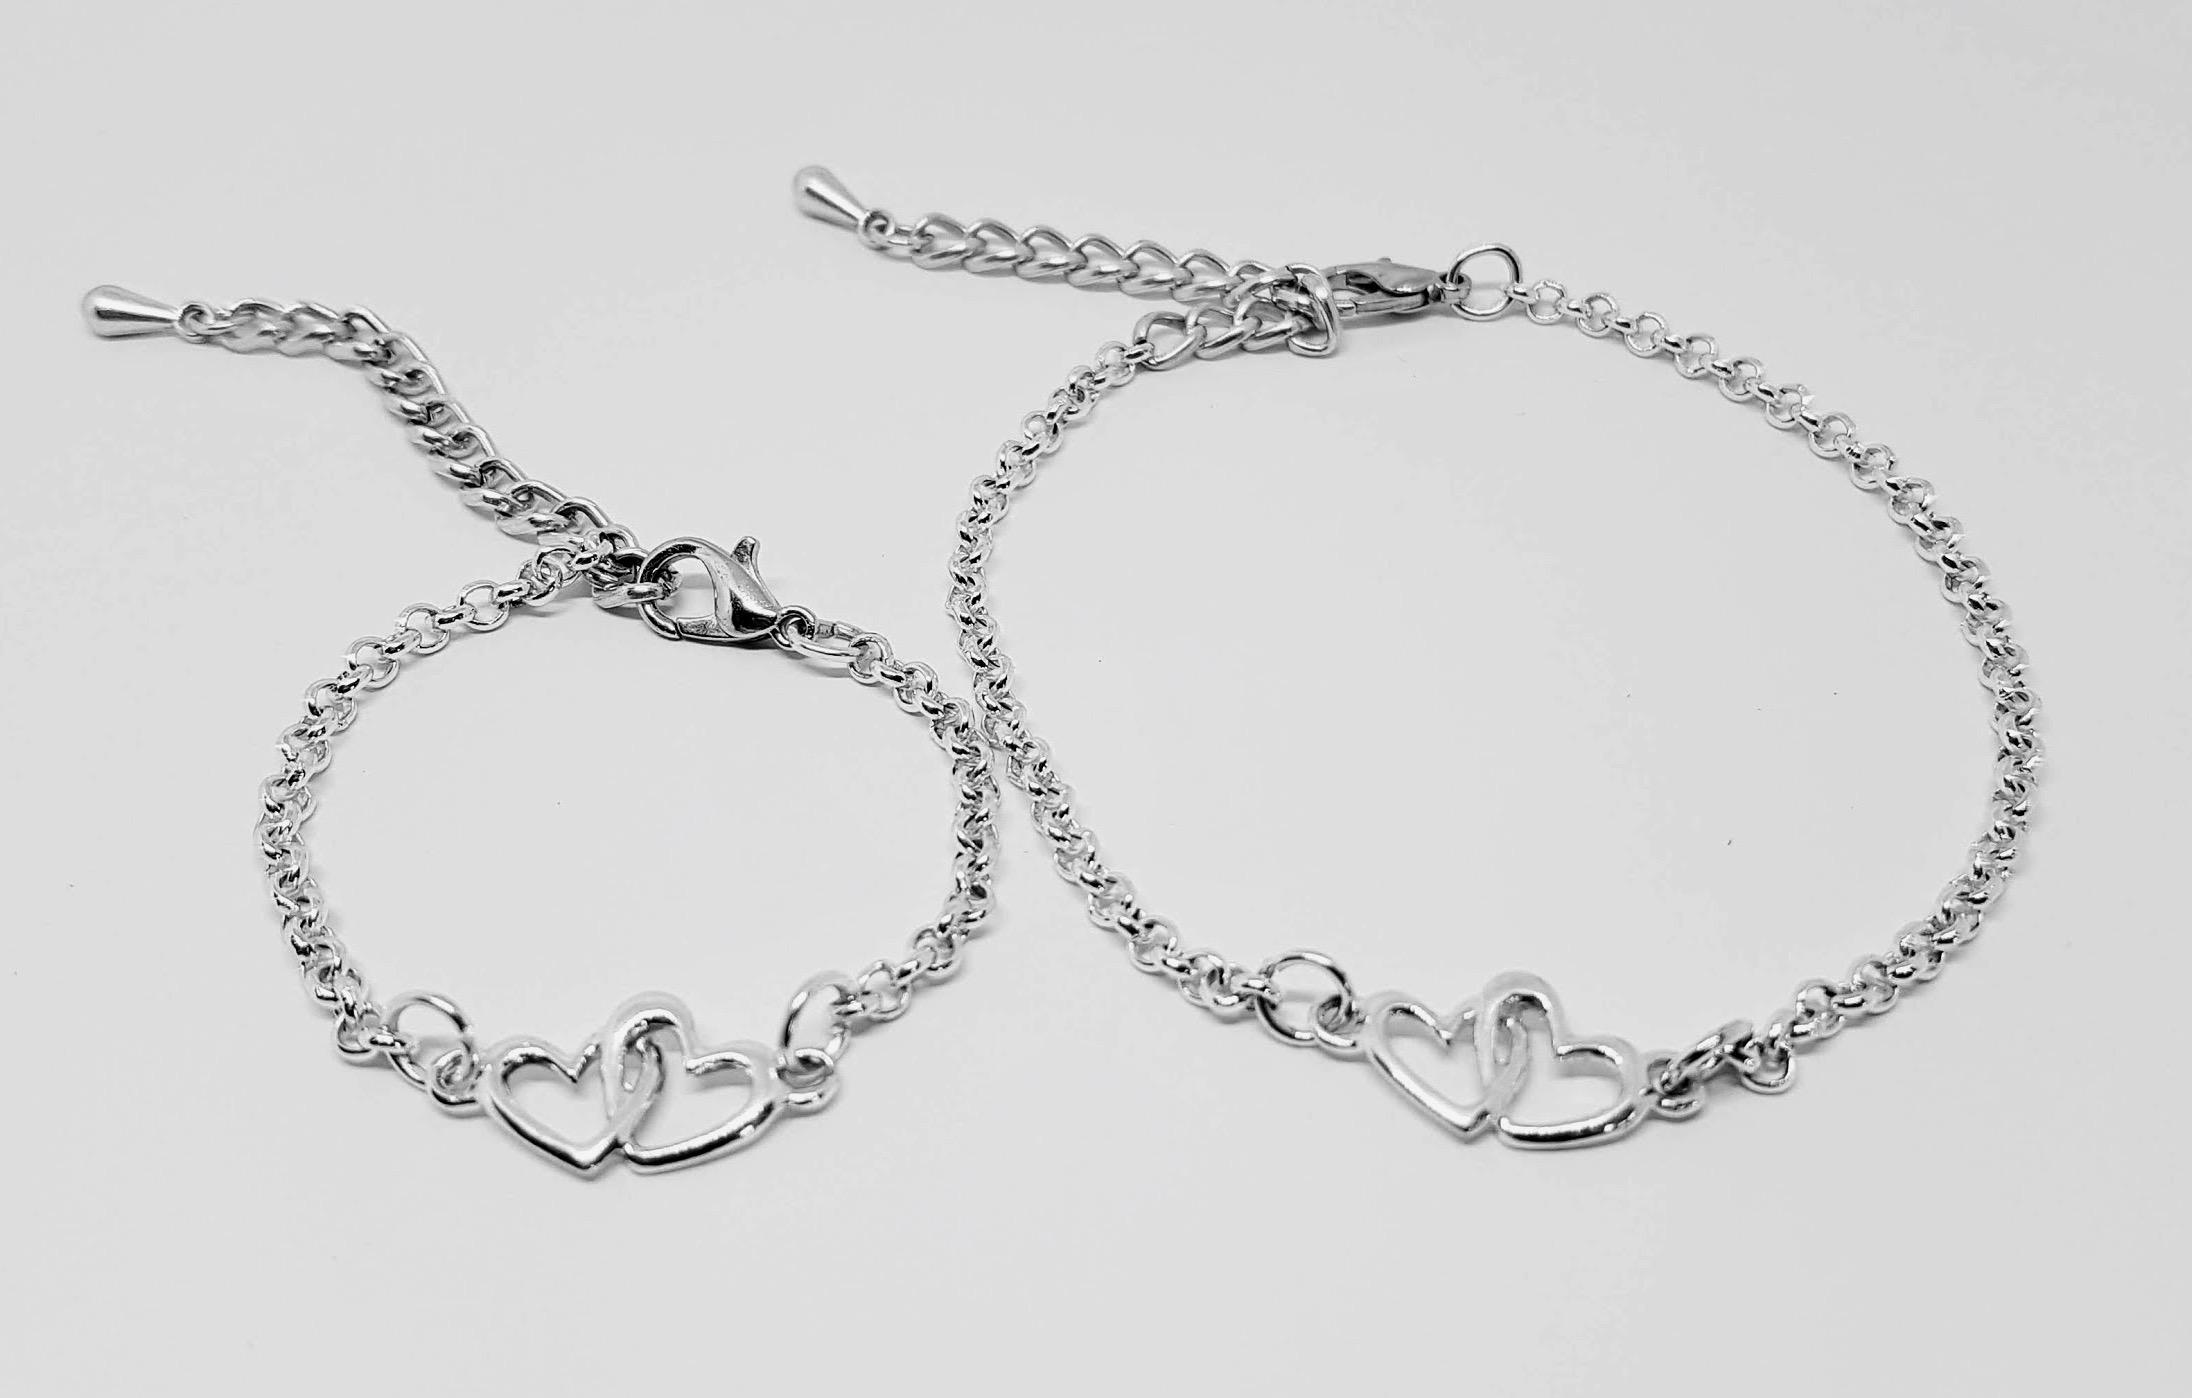 Verwonderend Moeder dochter armband ⋆ Mi Mimma ⋆ twinnen zilver hart⋆ MV-12